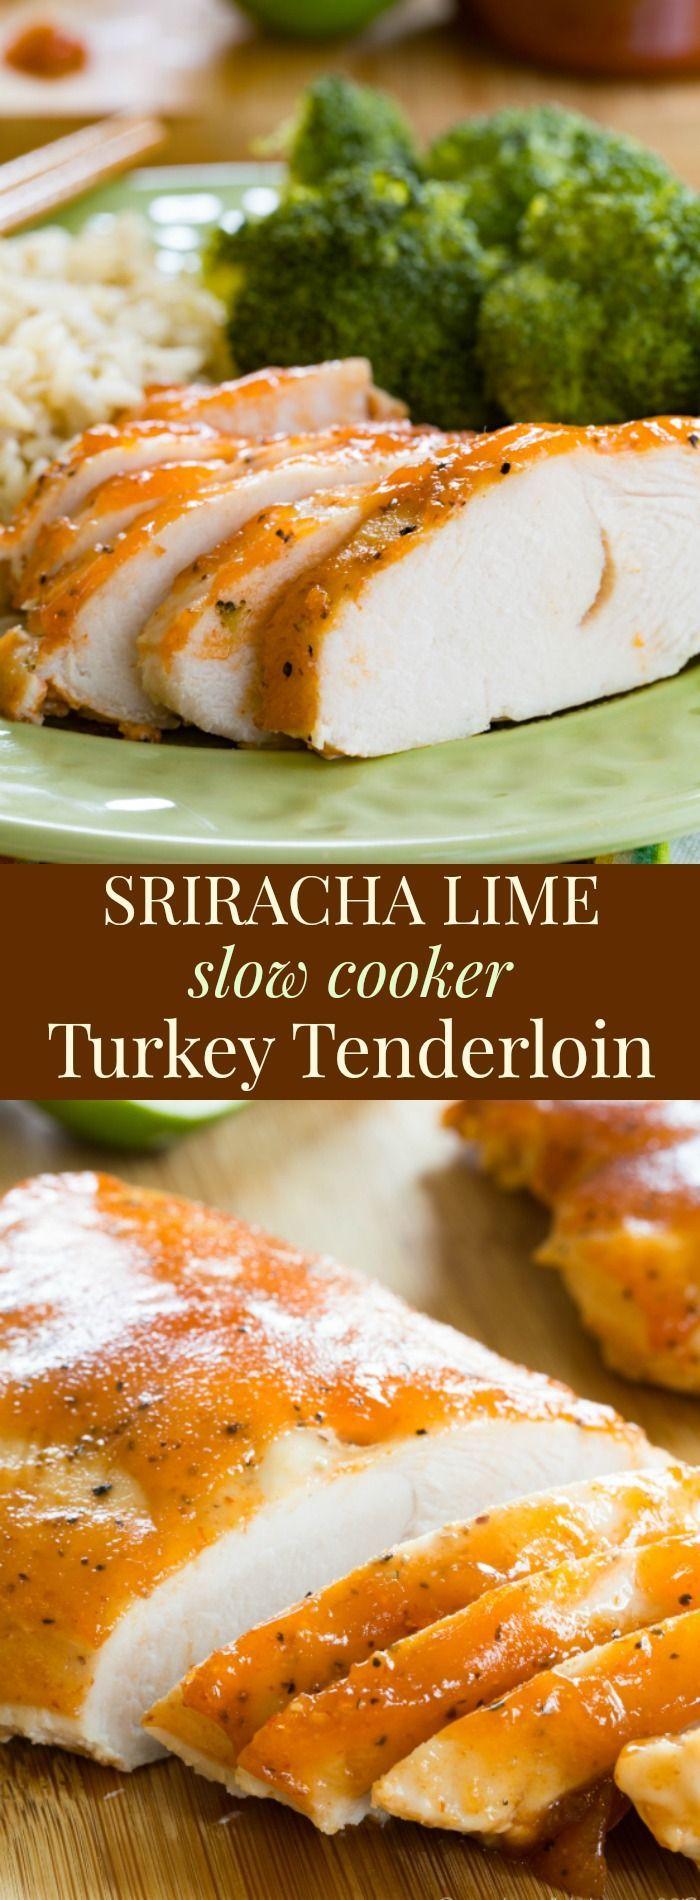 Photo of Sriracha Lime Slow Cooker Turkey Breast Tenderloin Recipe